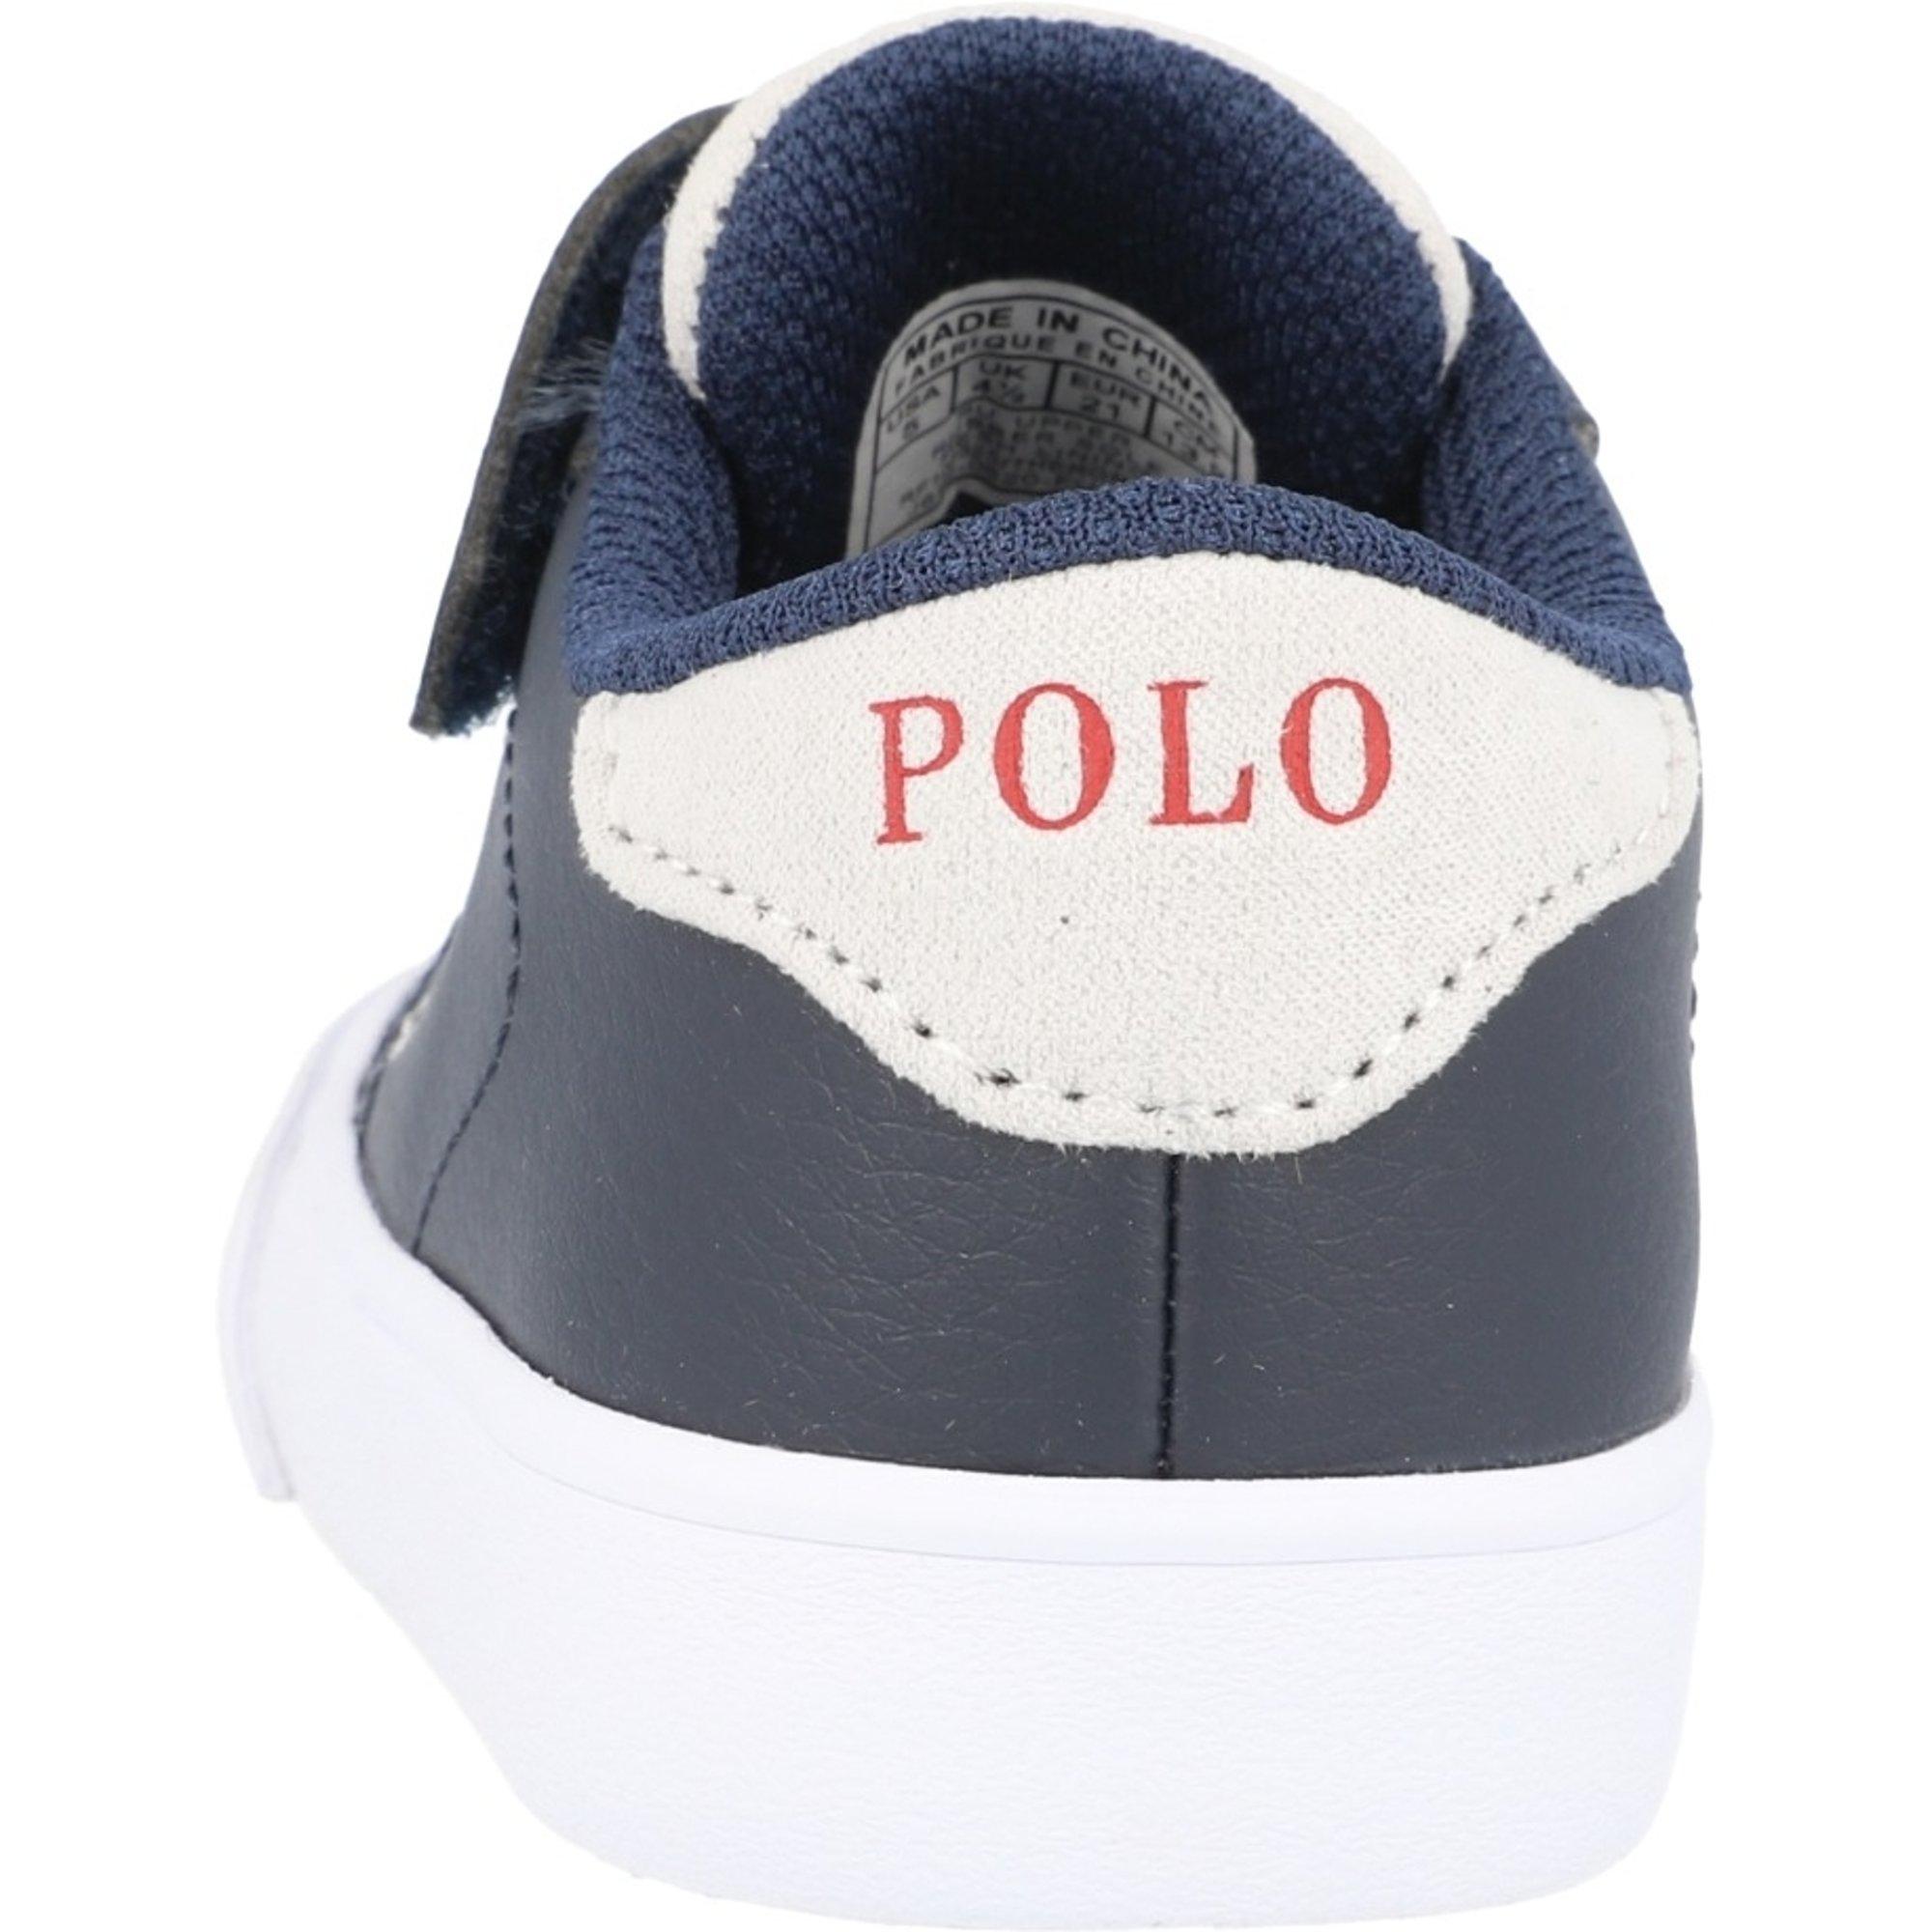 Polo Ralph Lauren Theron III PS T Navy/Light Grey Tumbled